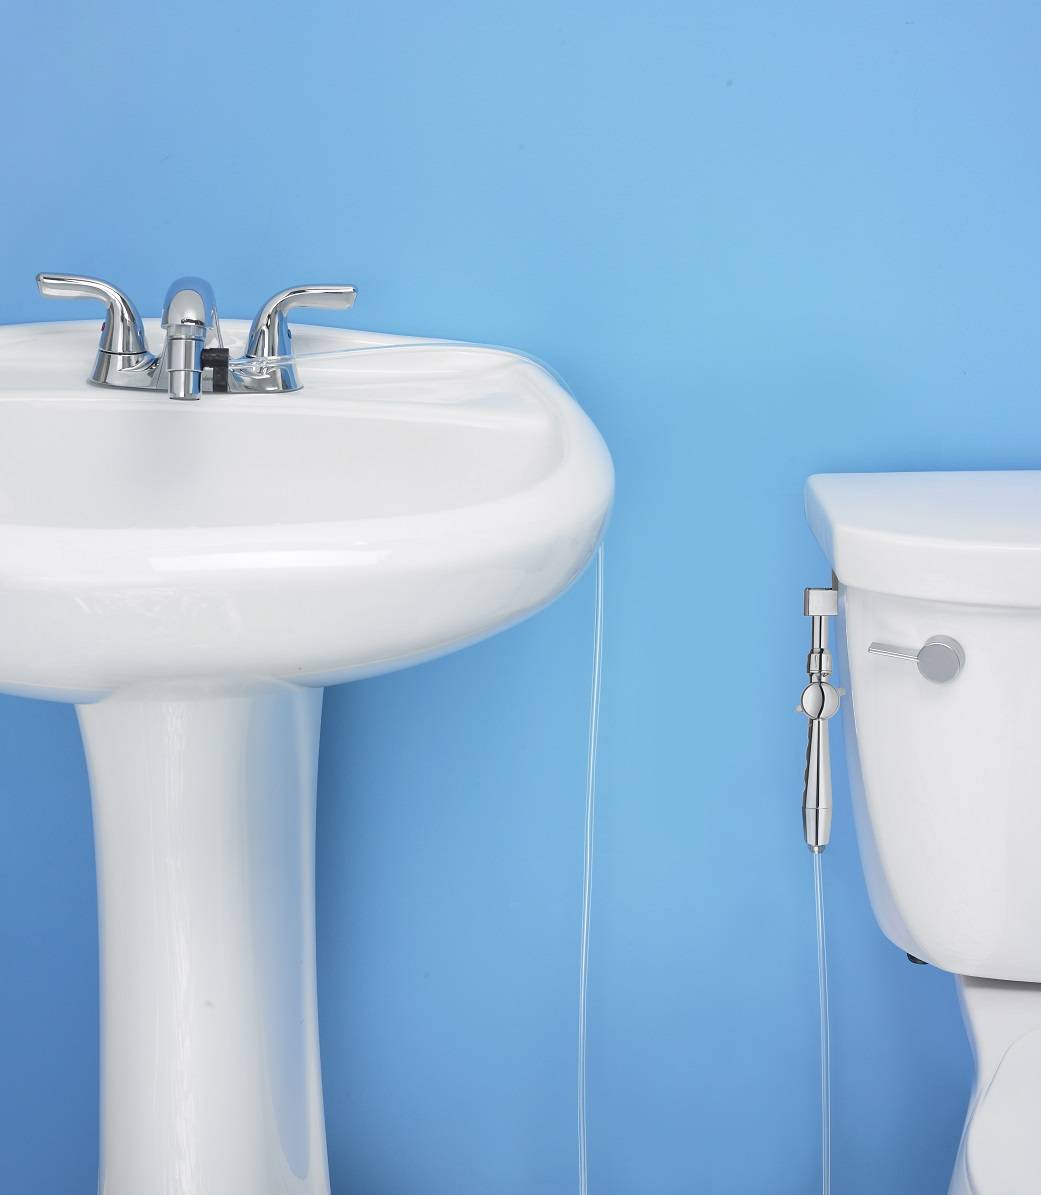 Aquaus 360 Hand Held Bidet for toilet - Shattaf : RinseWorks